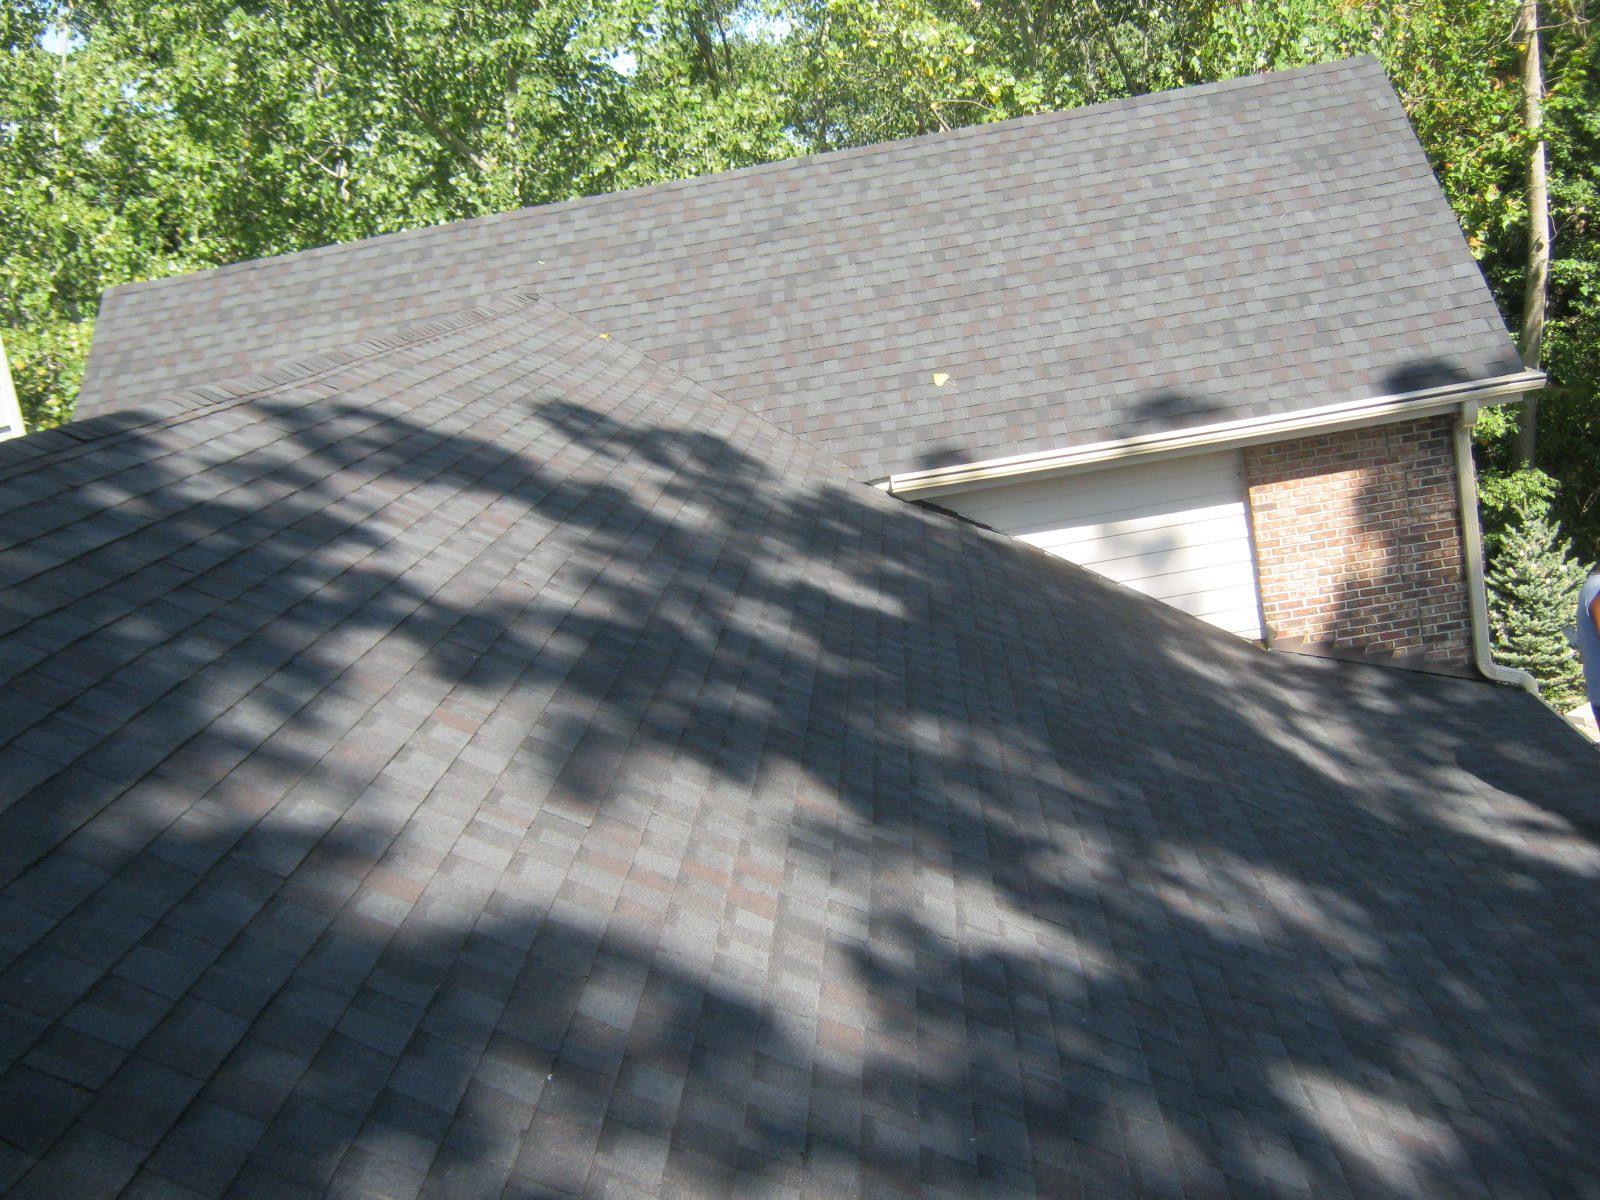 Best Tamko Heritage Black Walnut Tamko Shingles Residential Roofing Exterior 400 x 300